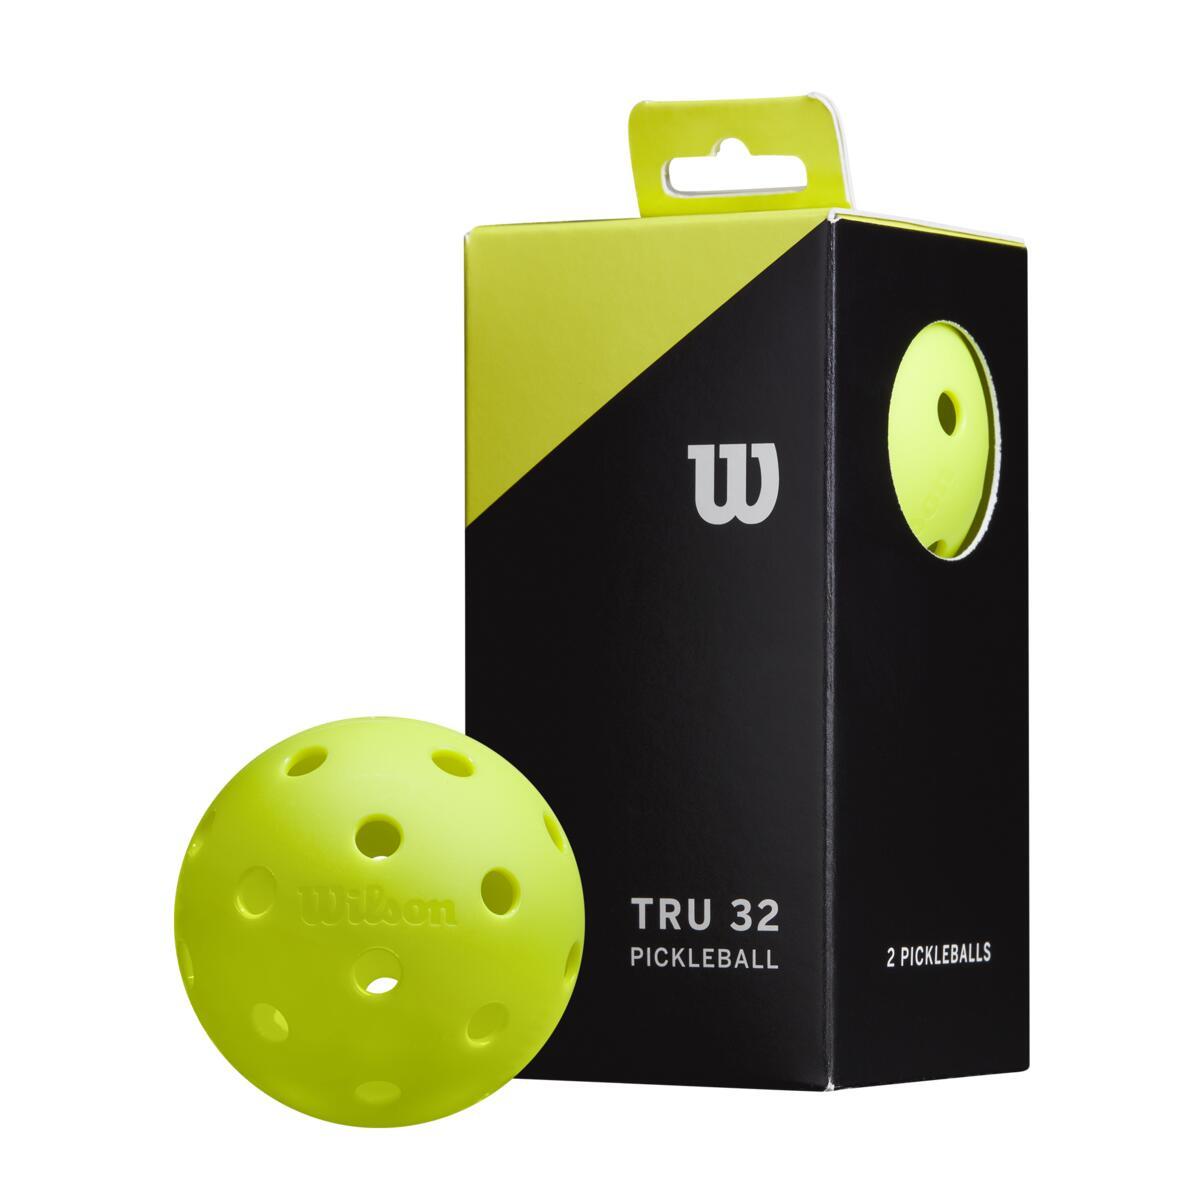 TRU 32 Pickleball Ball